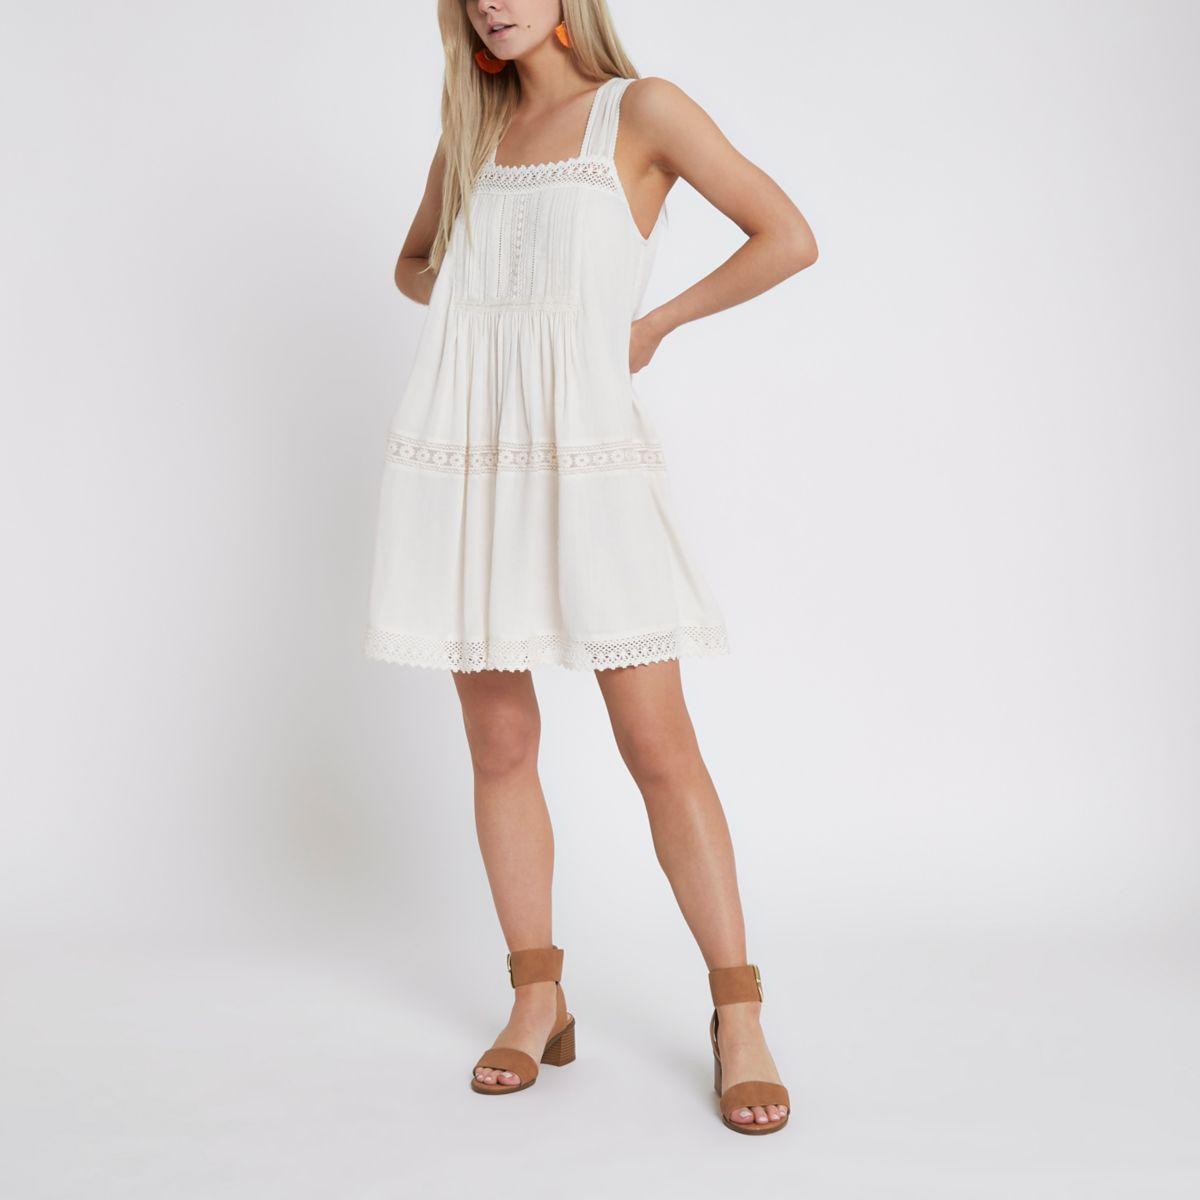 Petite cream lace trim open back swing dress